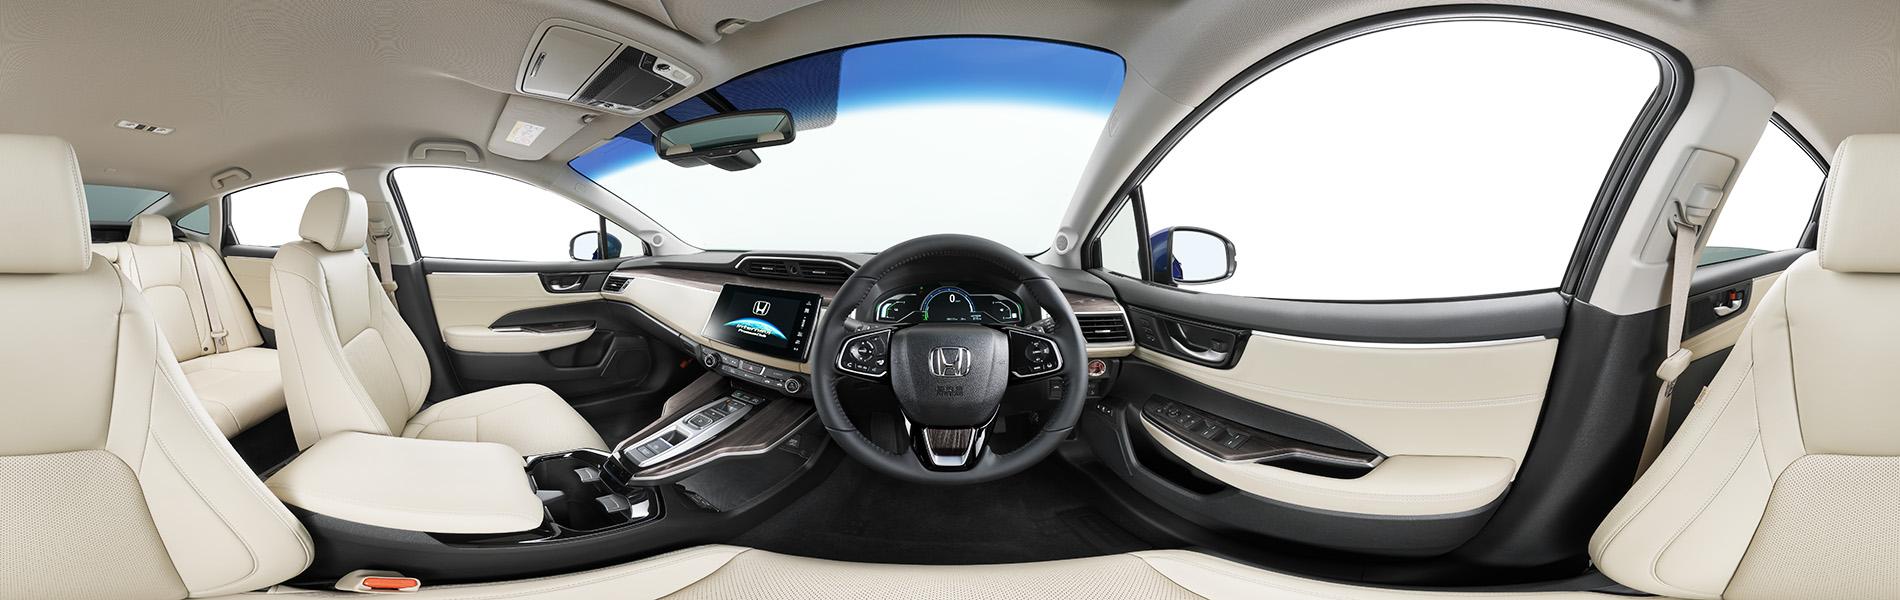 HONDA CLARITY Interior Panorama VR